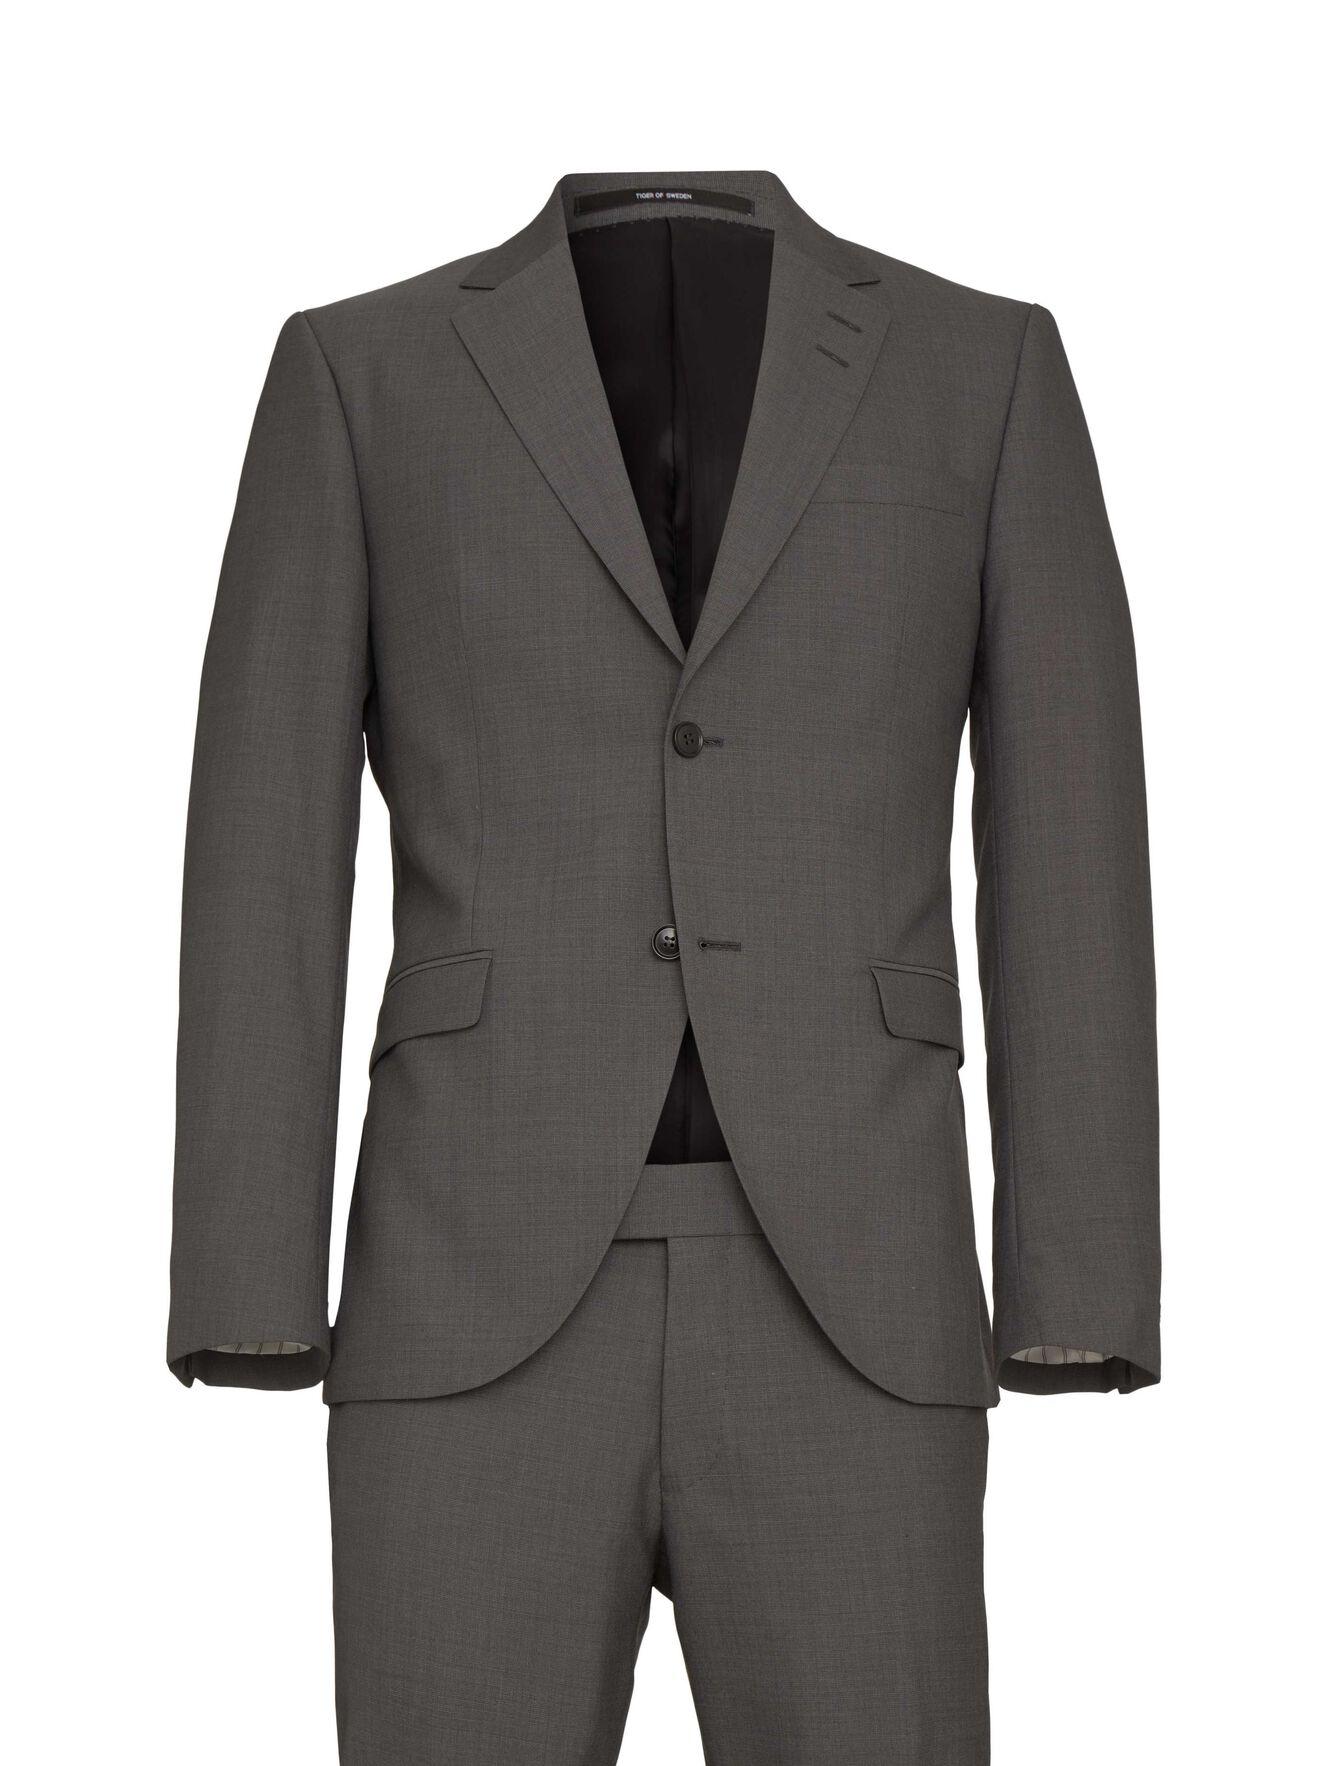 S.Jamonte Suit in Phantom from Tiger of Sweden